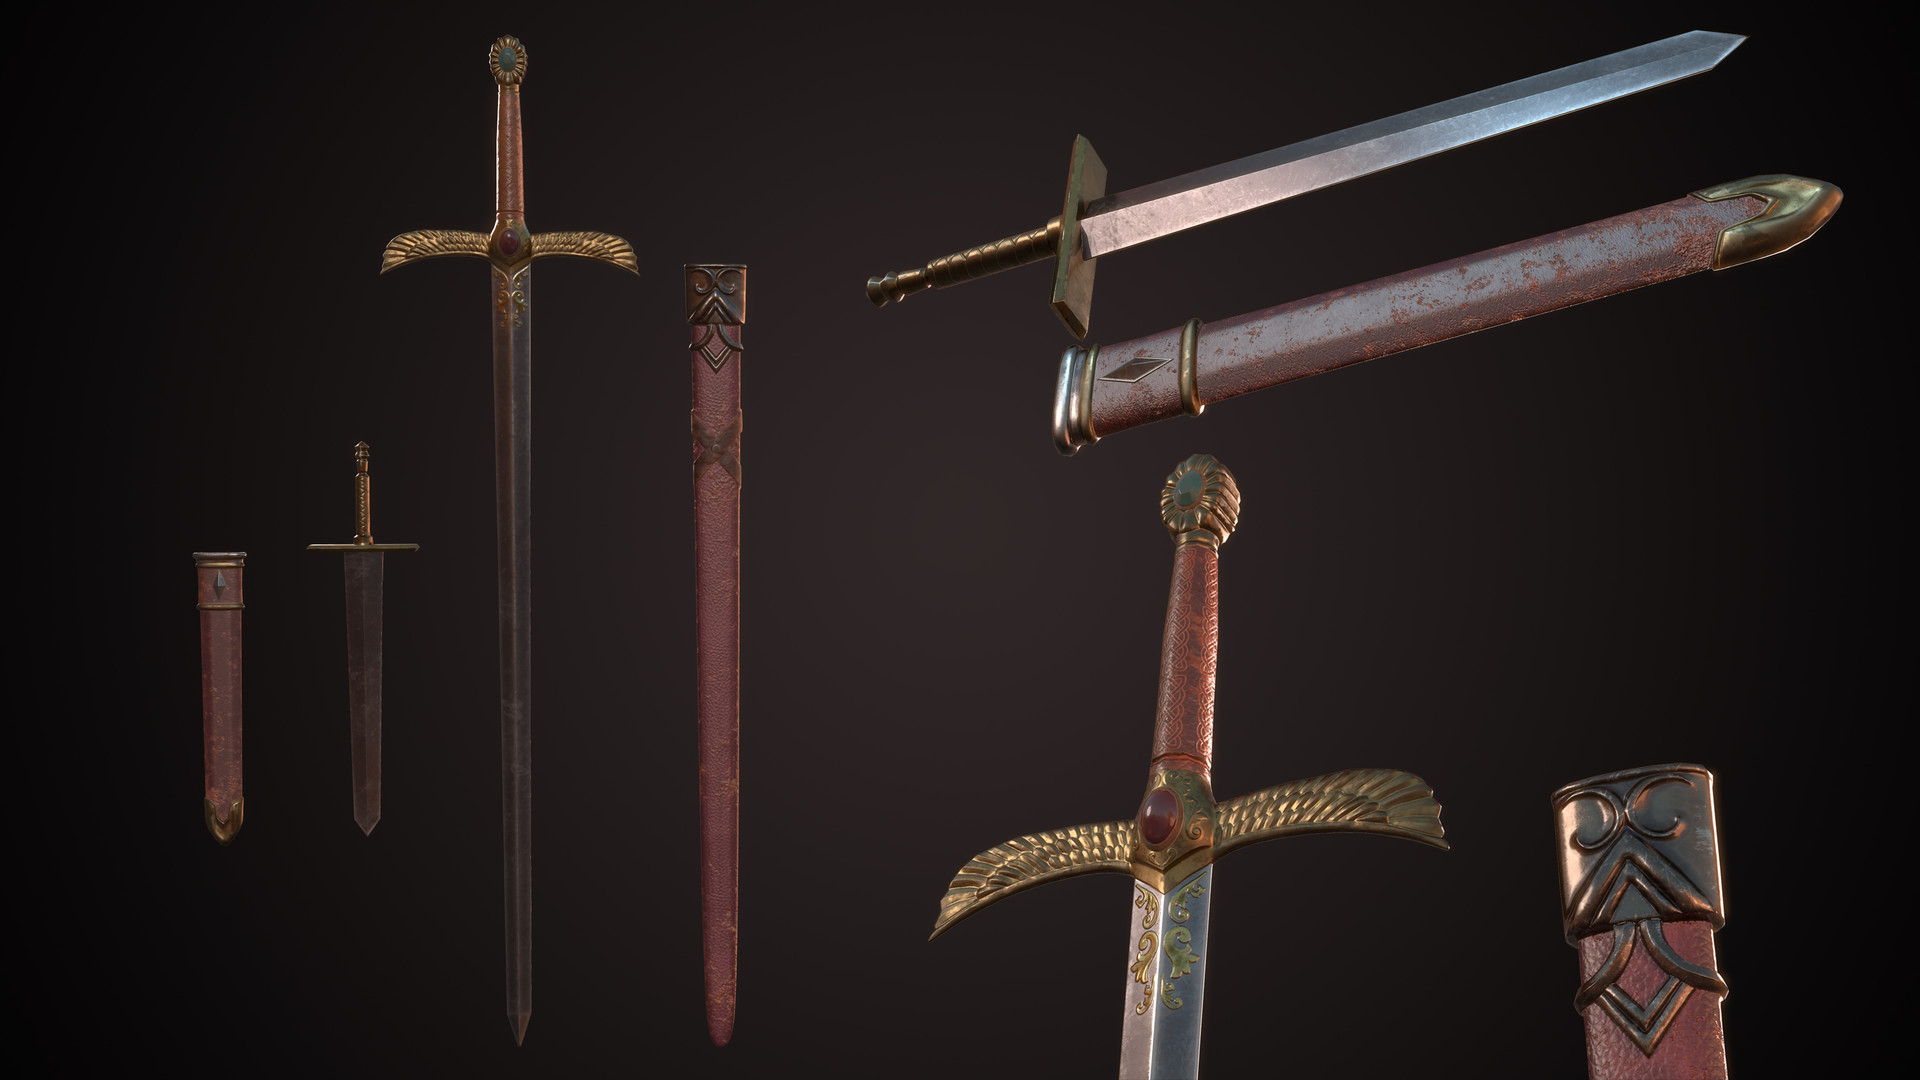 [Image: jing-xi-chong-swords.jpg?1523976272]